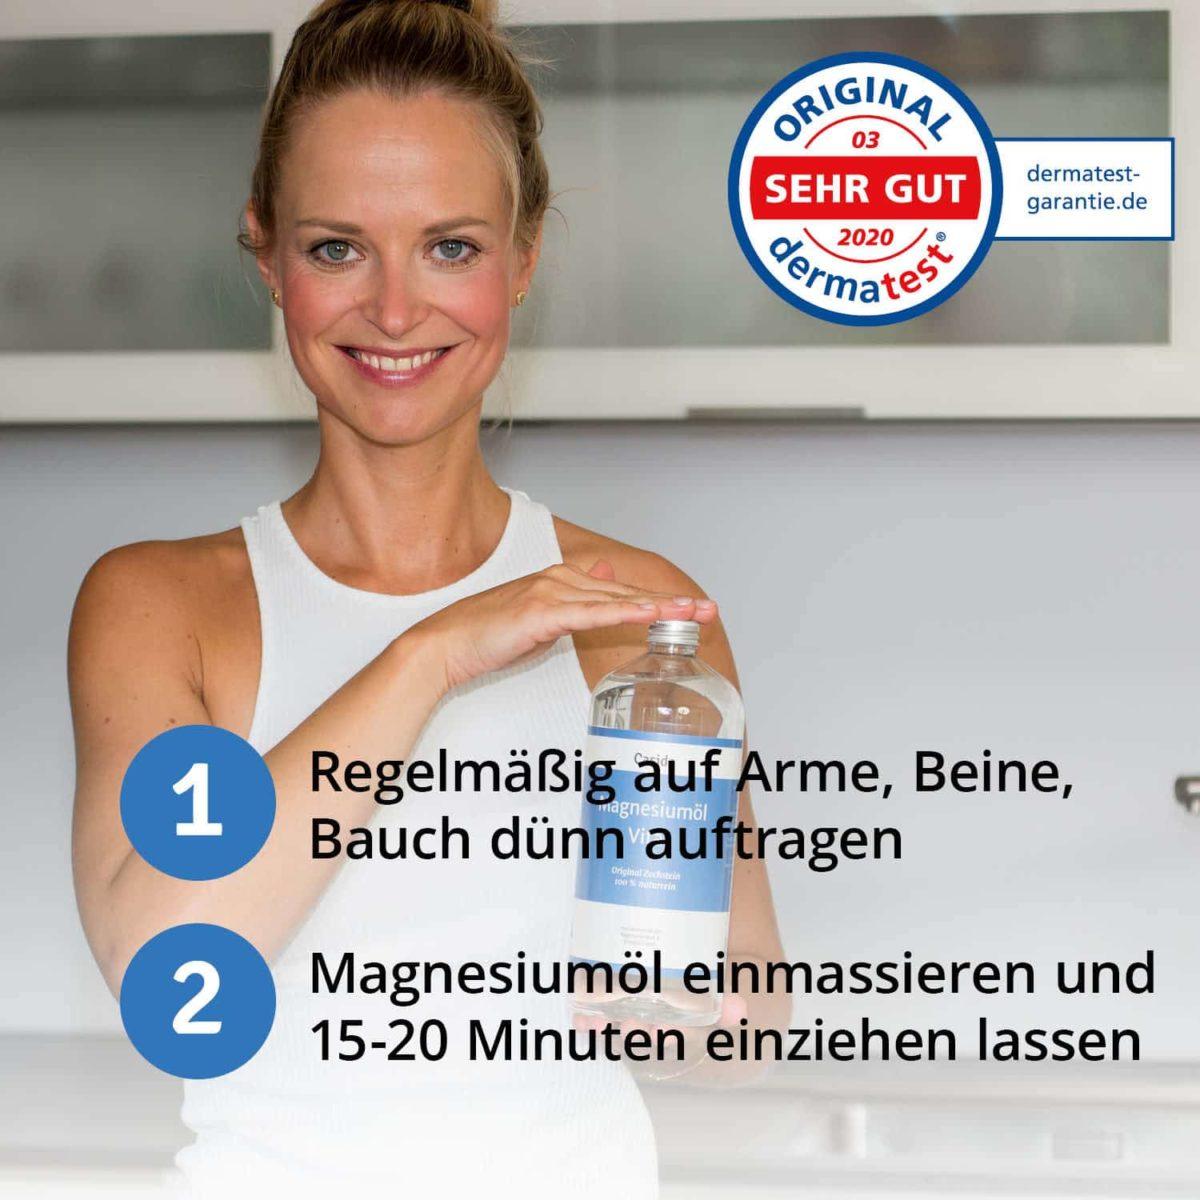 Casida Magnesiumöl Vital Zechstein 1000 ml 11730233 PZN Apotheke Nachfüllflasche Sport6